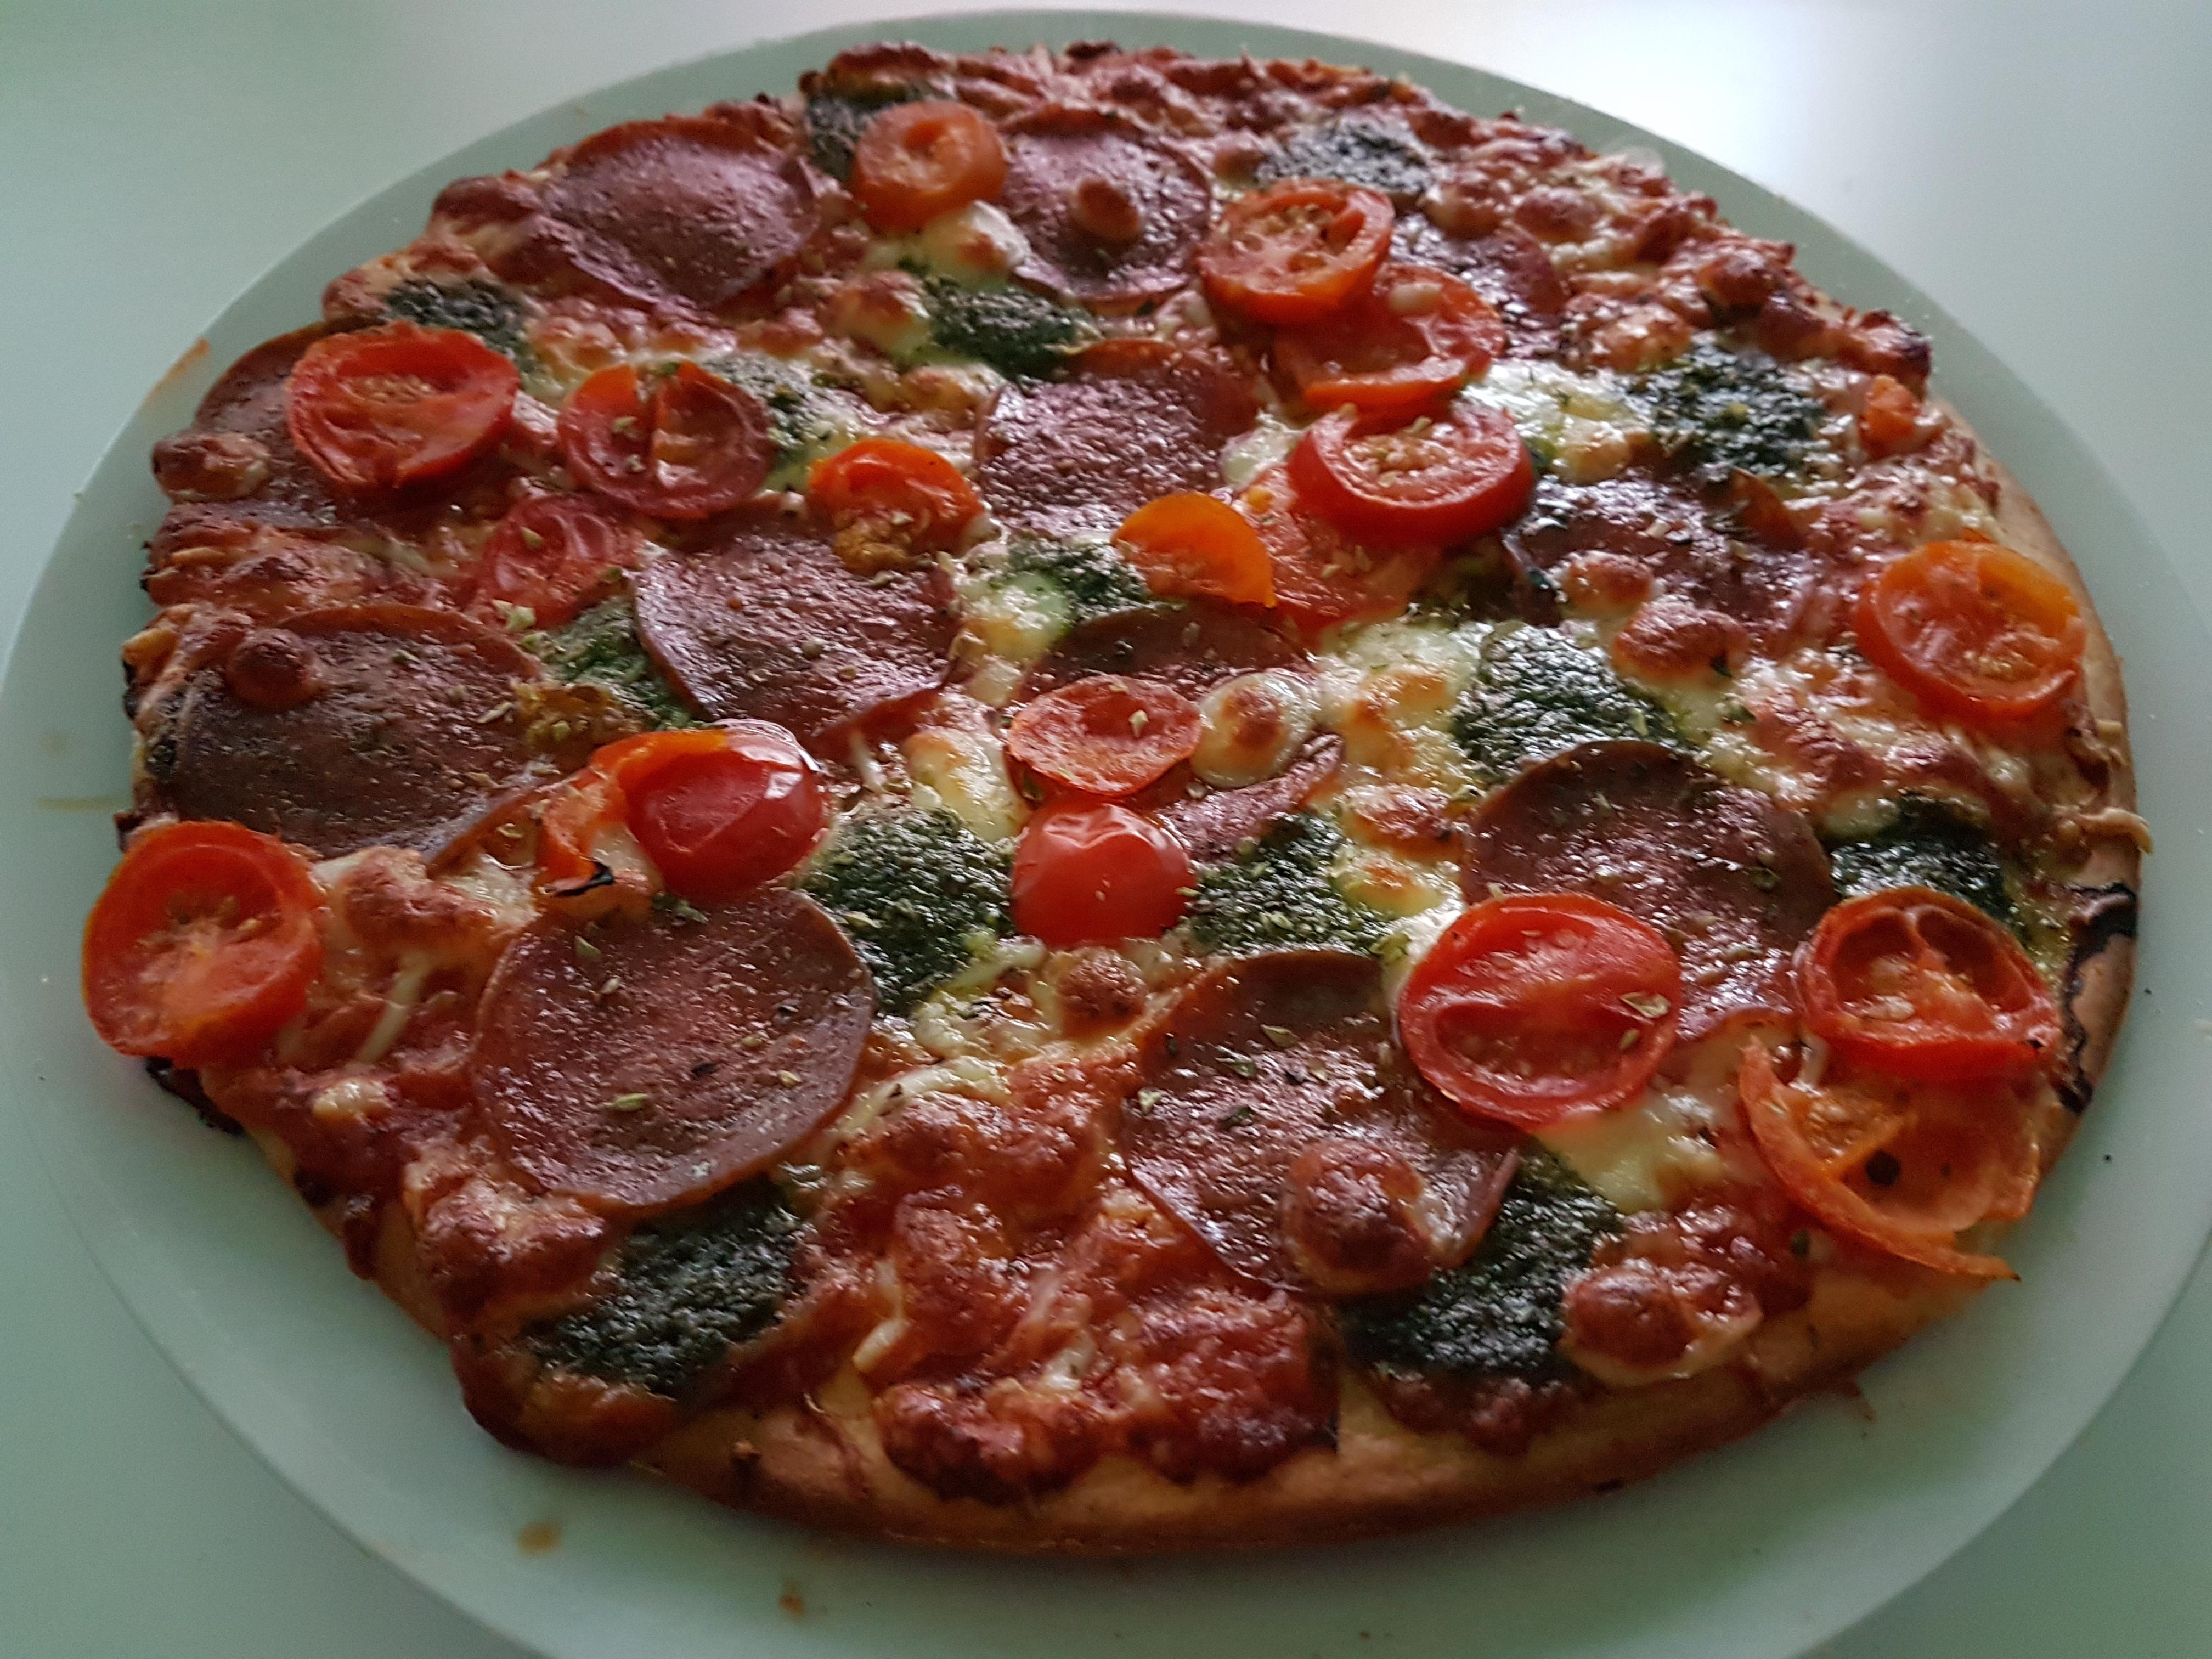 http://foodloader.net/Holz_2017-04-28_Pizza.jpg